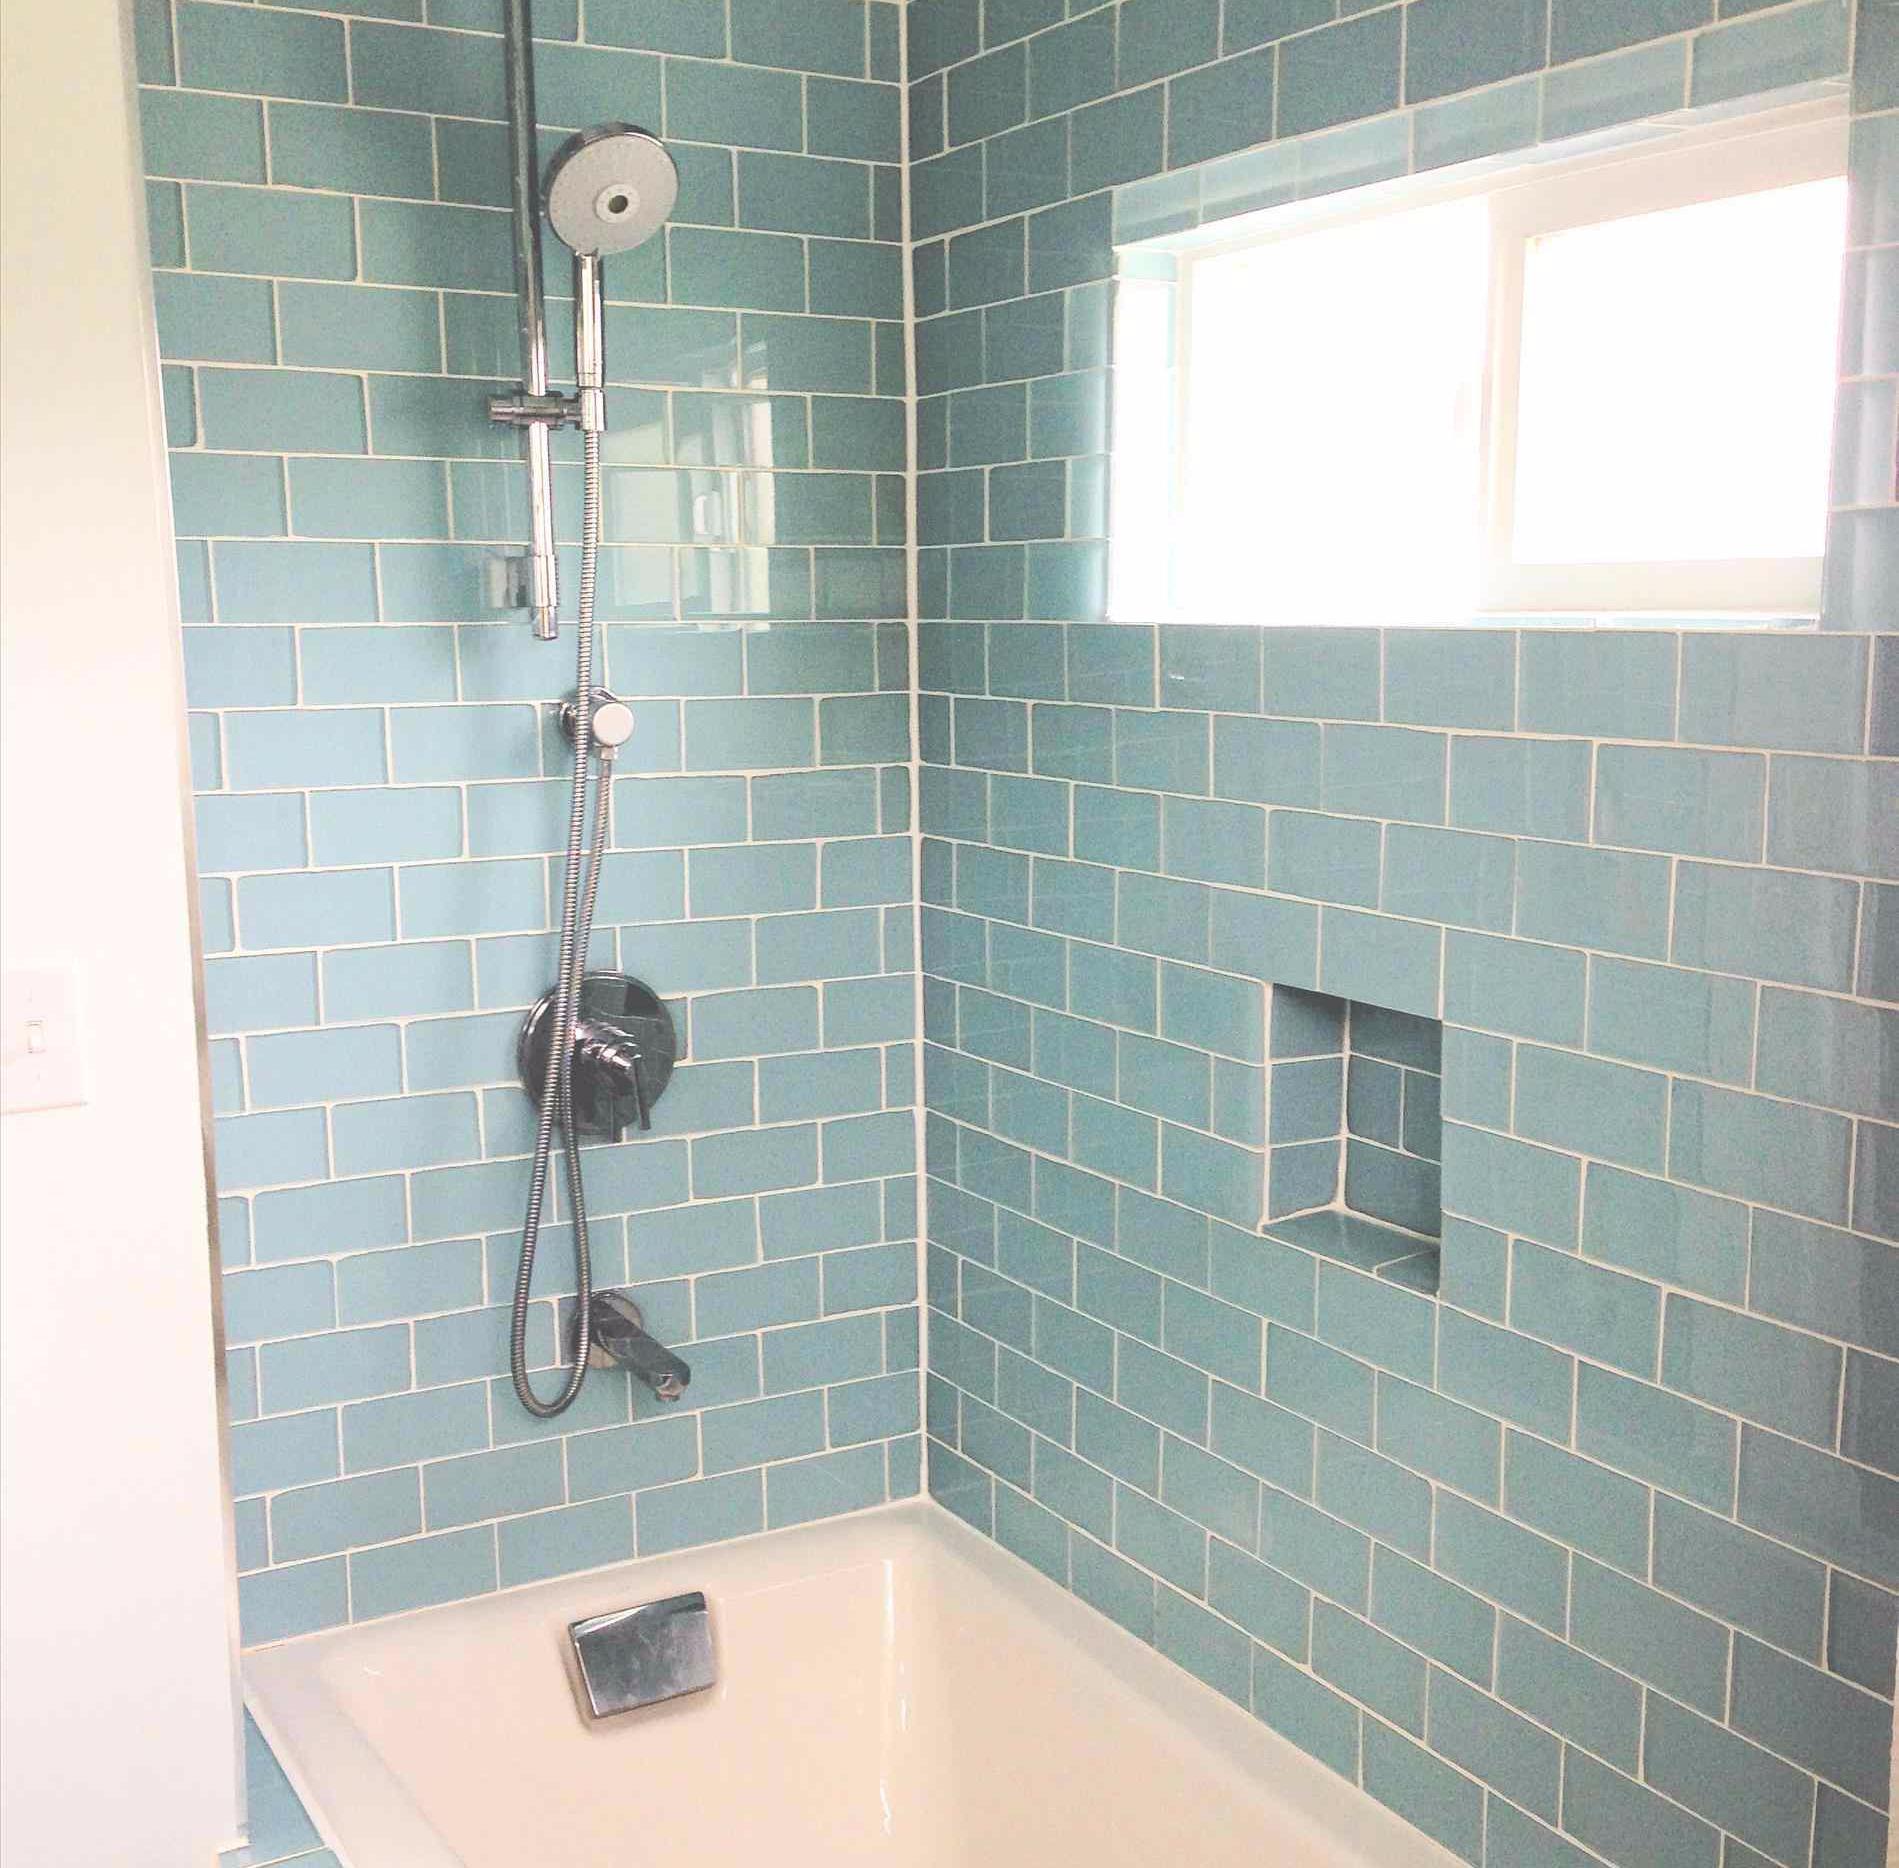 7 desain keramik dinding kamar mandi ini bisa bikin kamu terhipnotis rh dekoruma com keramik dinding kamar mandi warna biru dinding keramik kamar mandi roman